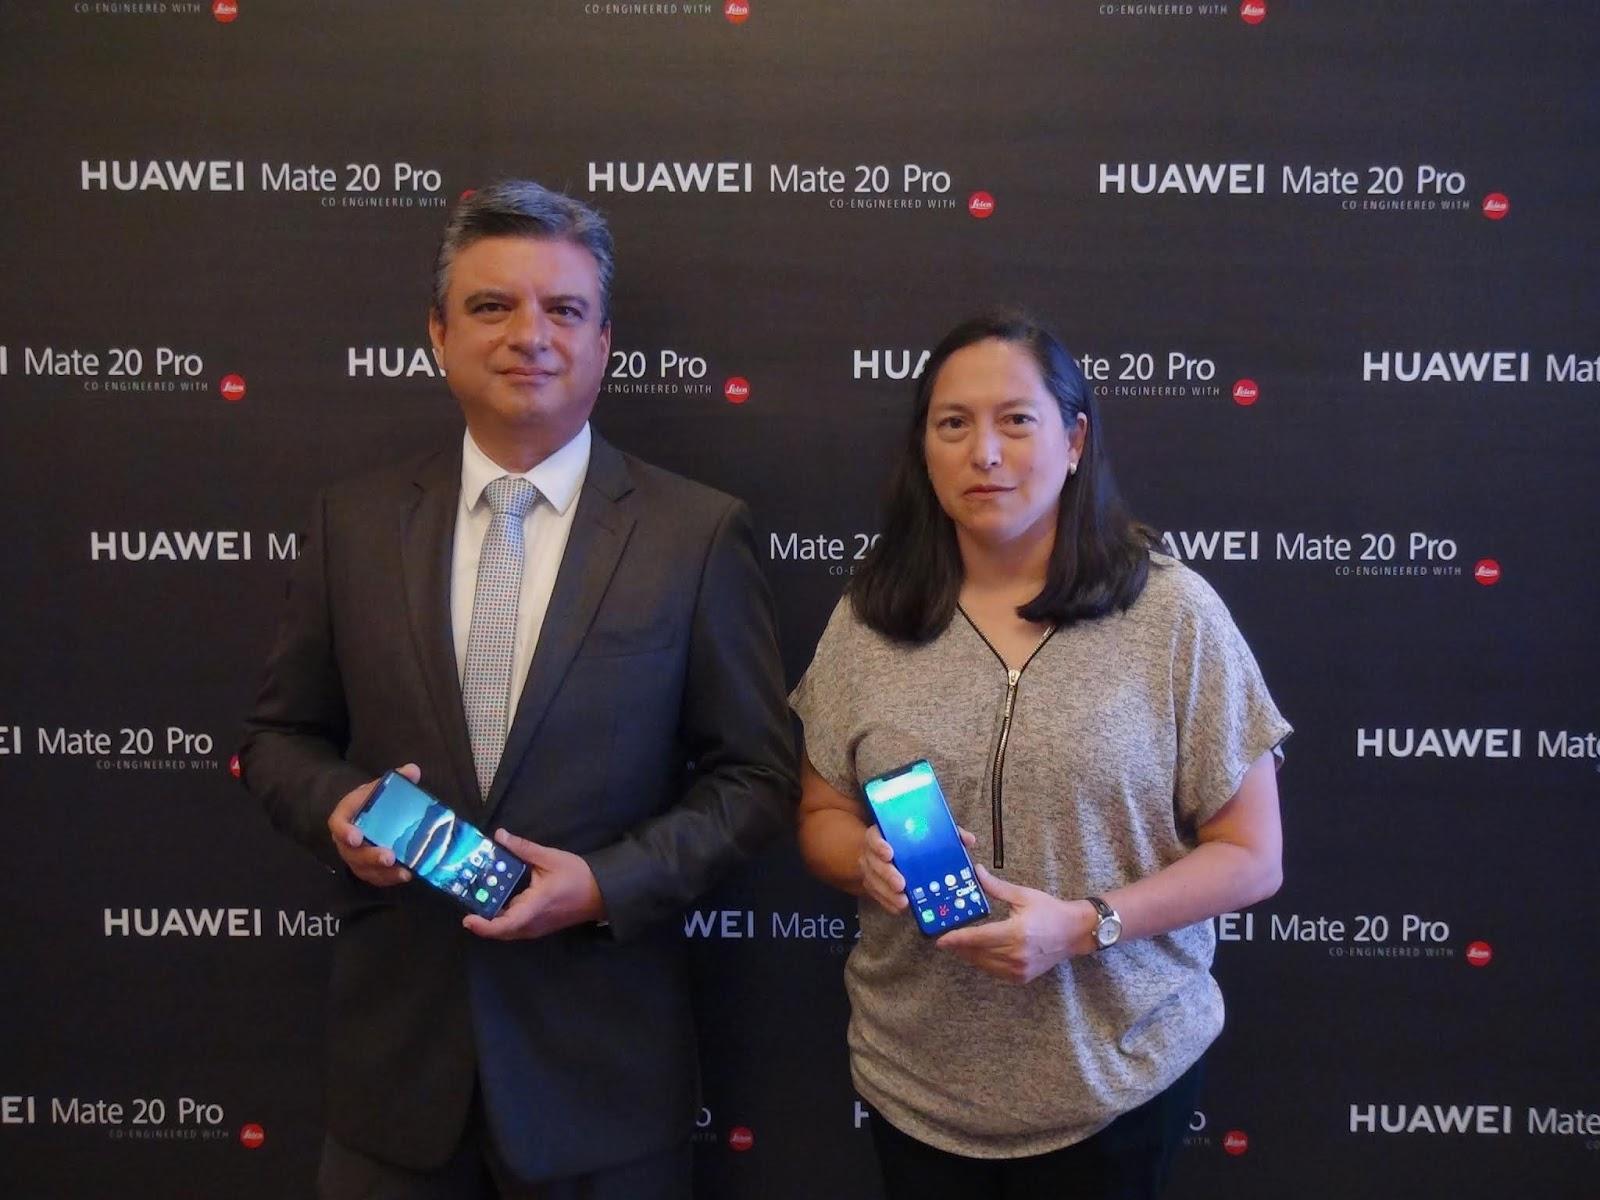 Huawei presenta el HUAWEI Mate 20 Pro en Ecuador